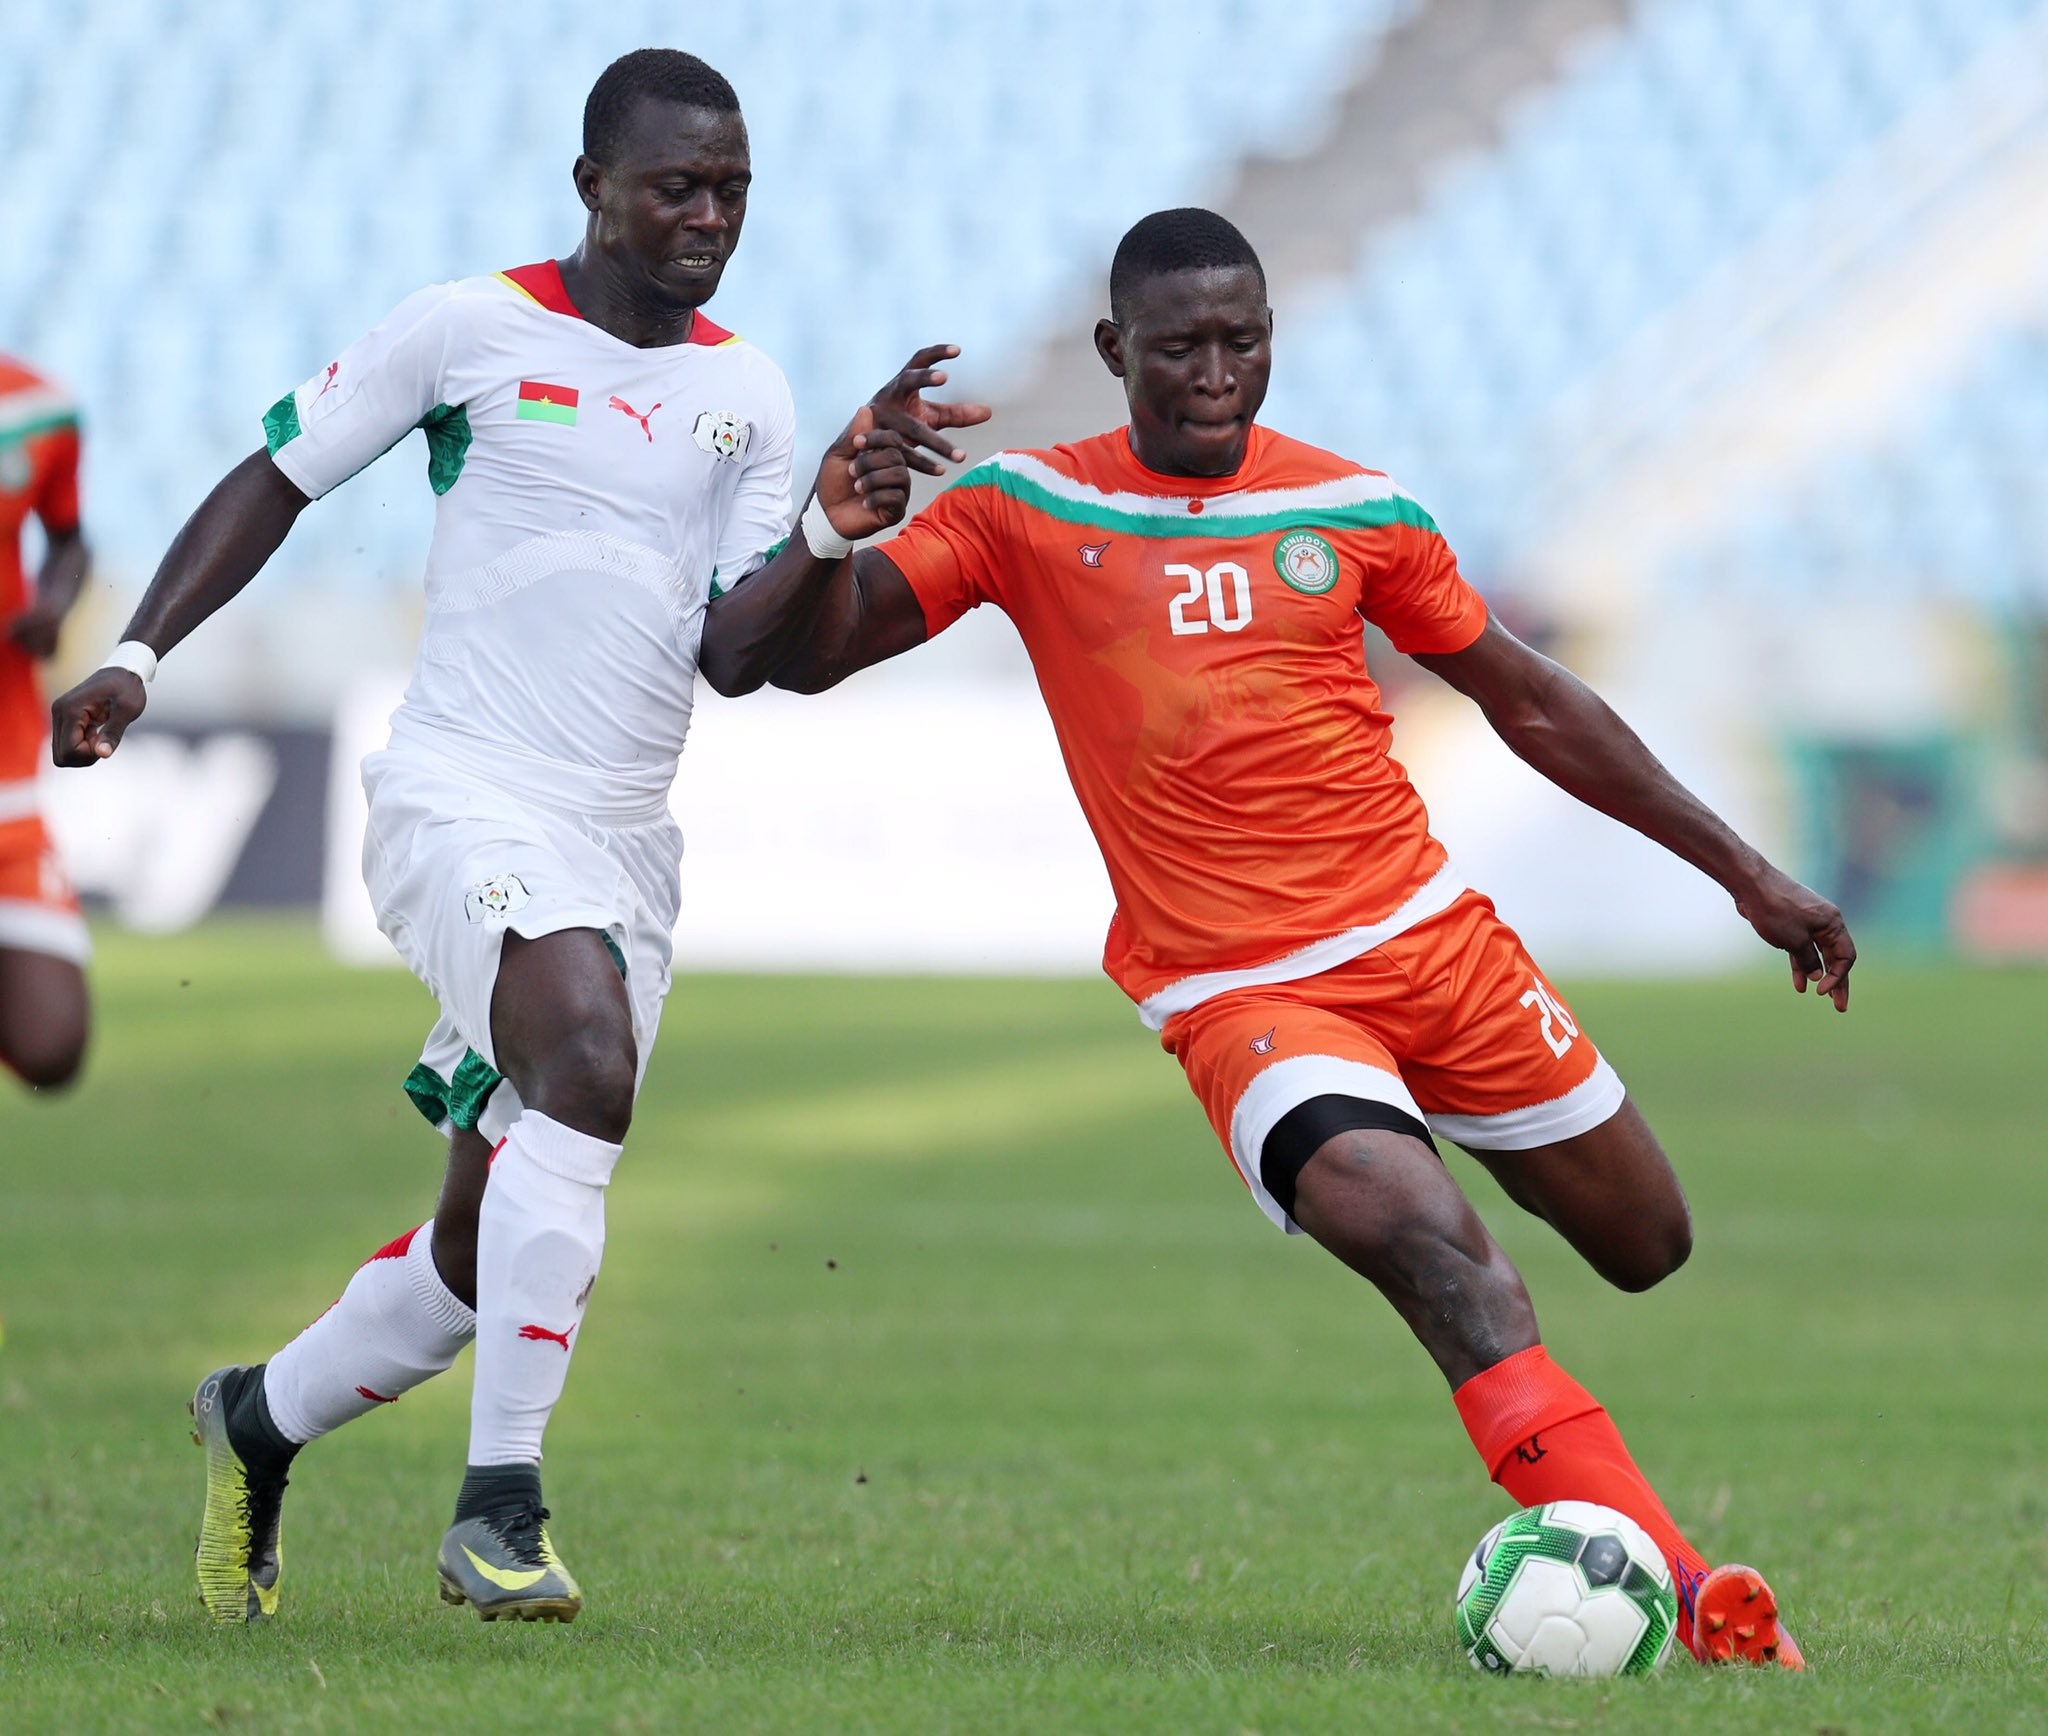 WAFU Cup: Niger Stun Burkina Faso To Advance Into Group